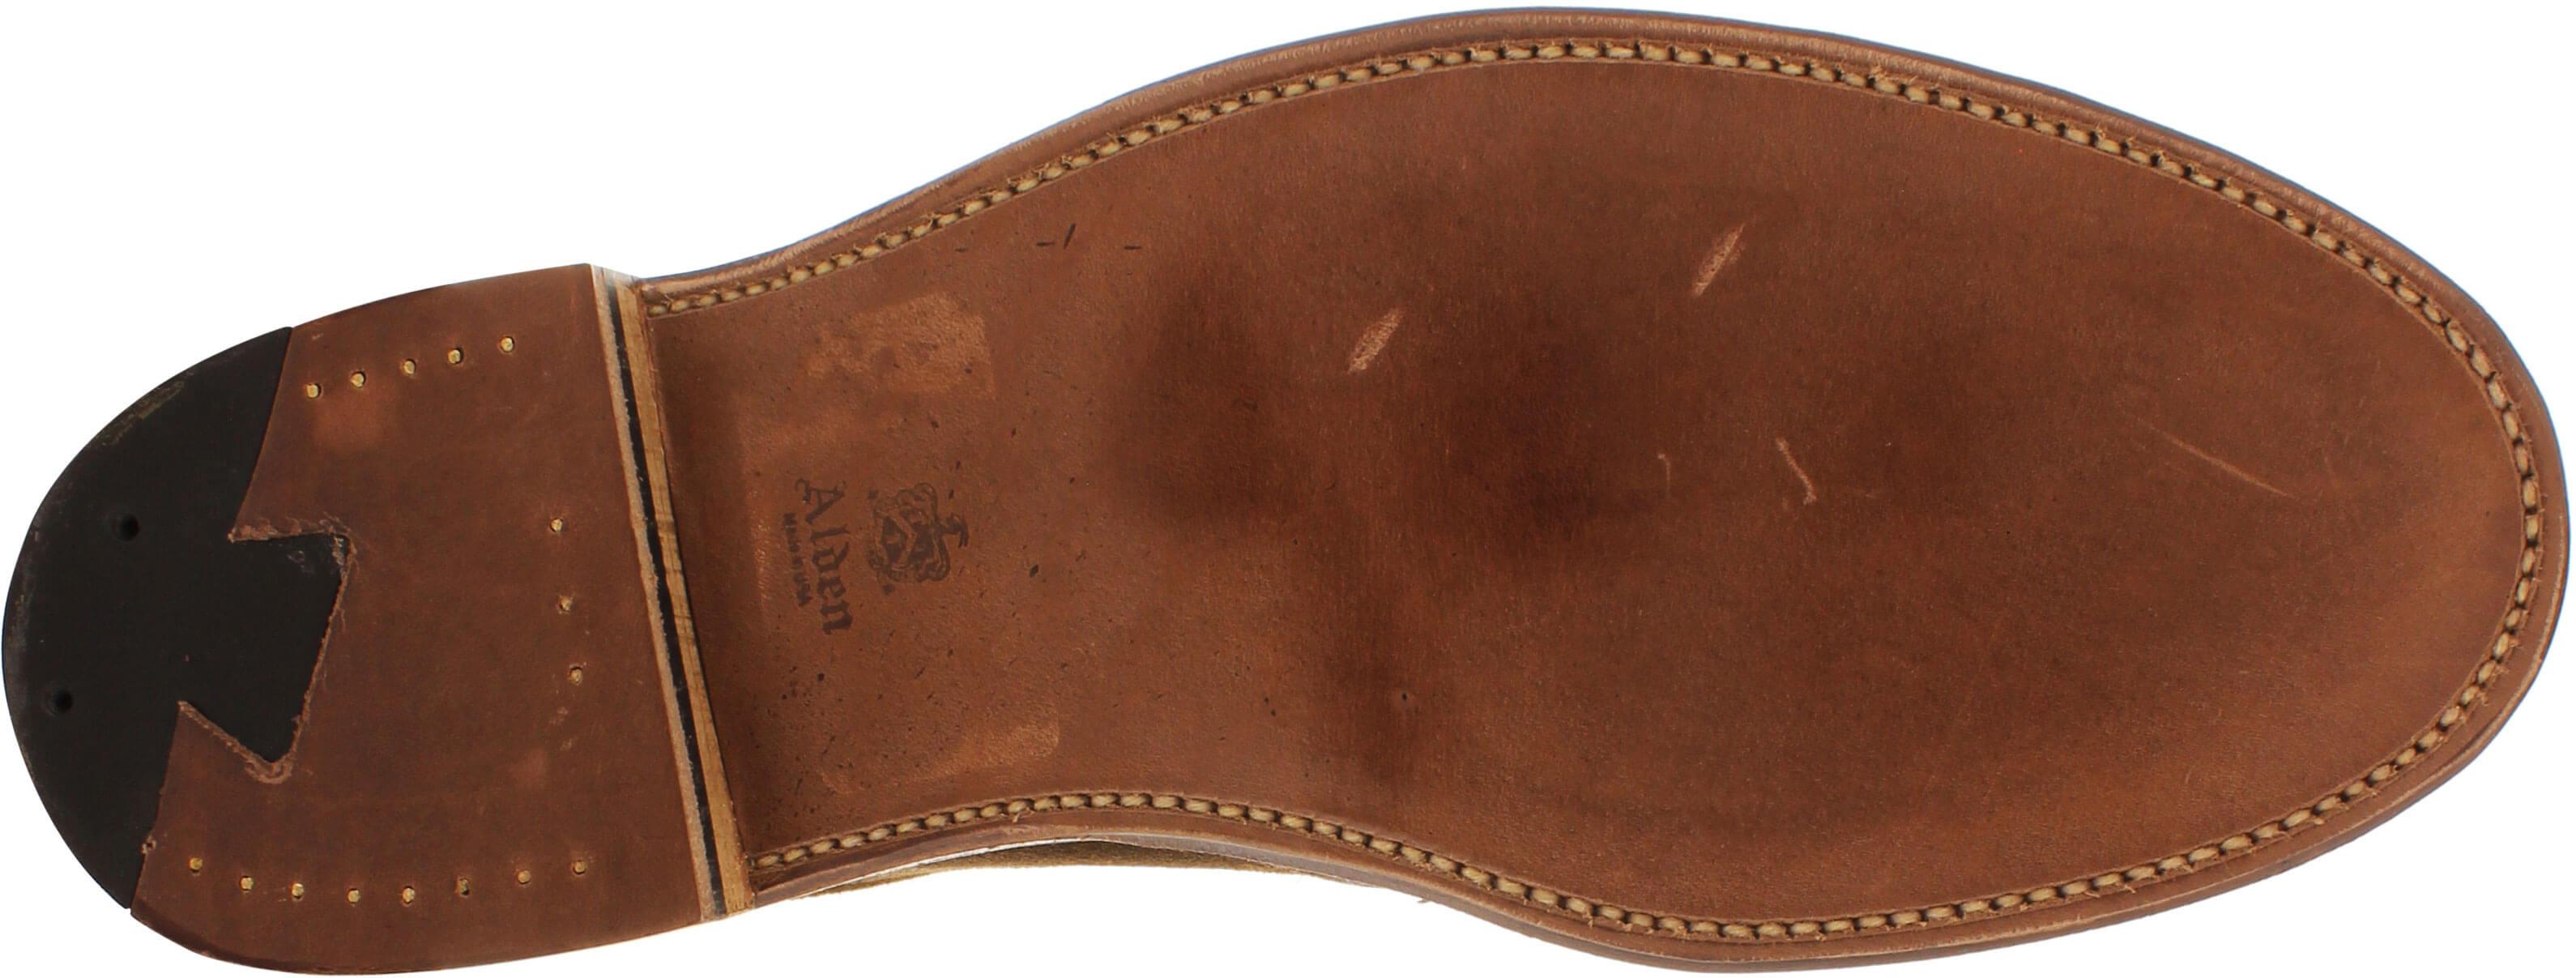 32d4a031f30 Alden Men's 1492 - Unlined Chukka Boot Flex Welt - Dark Brown Suede